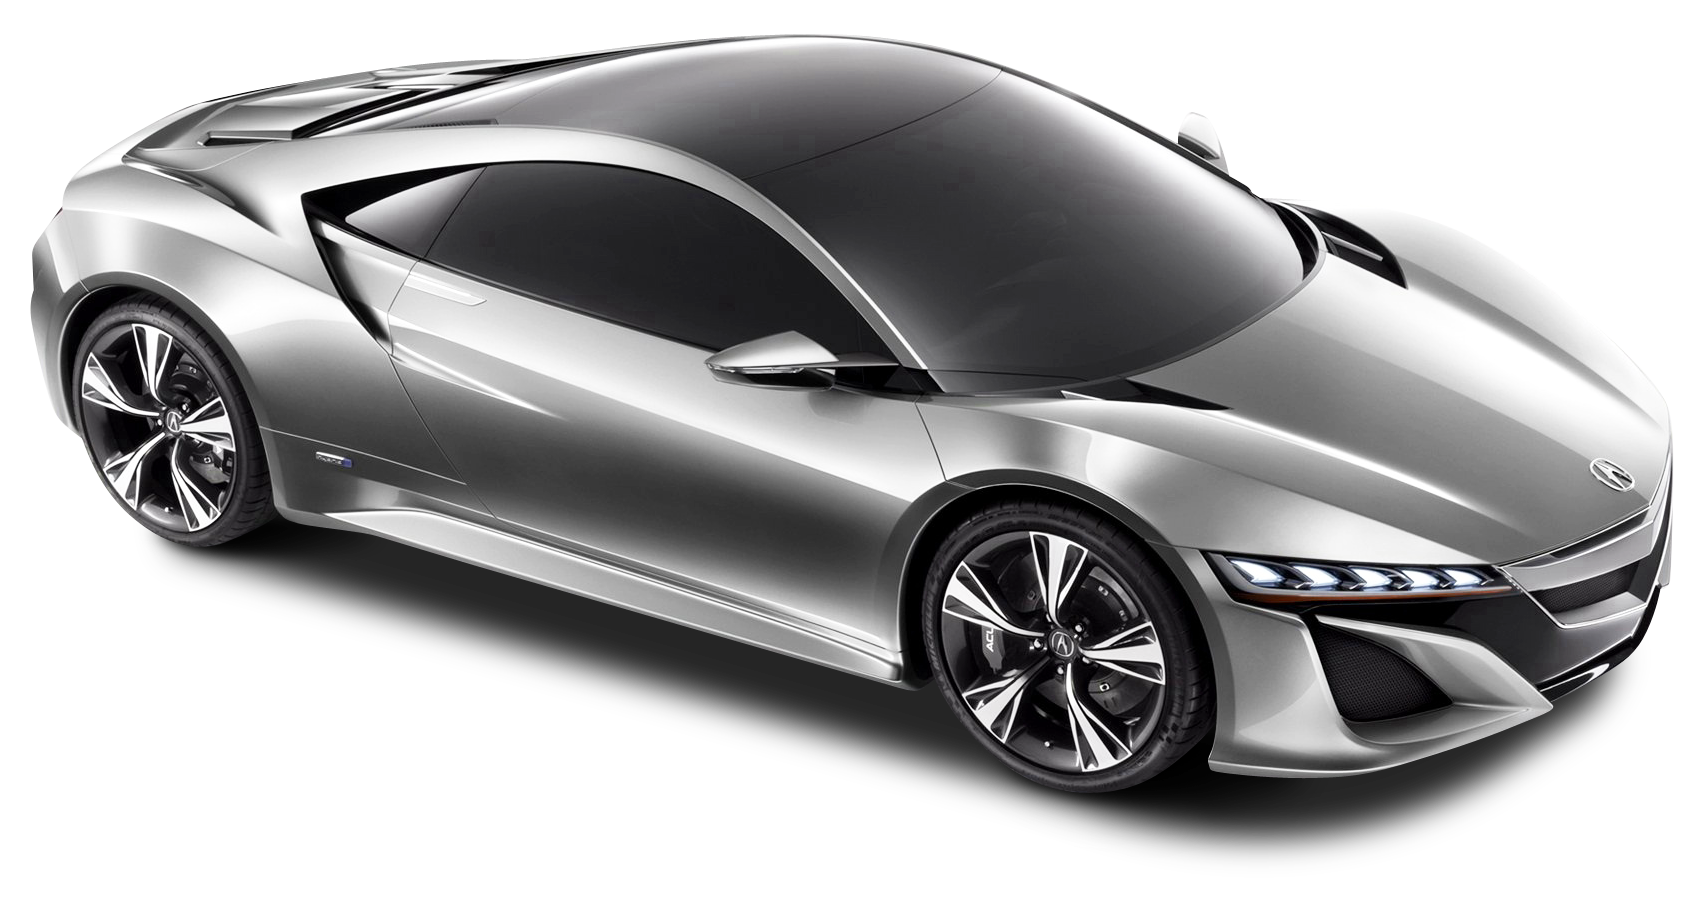 Acura Nsx Silver Car Png Image Silver Car Acura Nsx Nsx